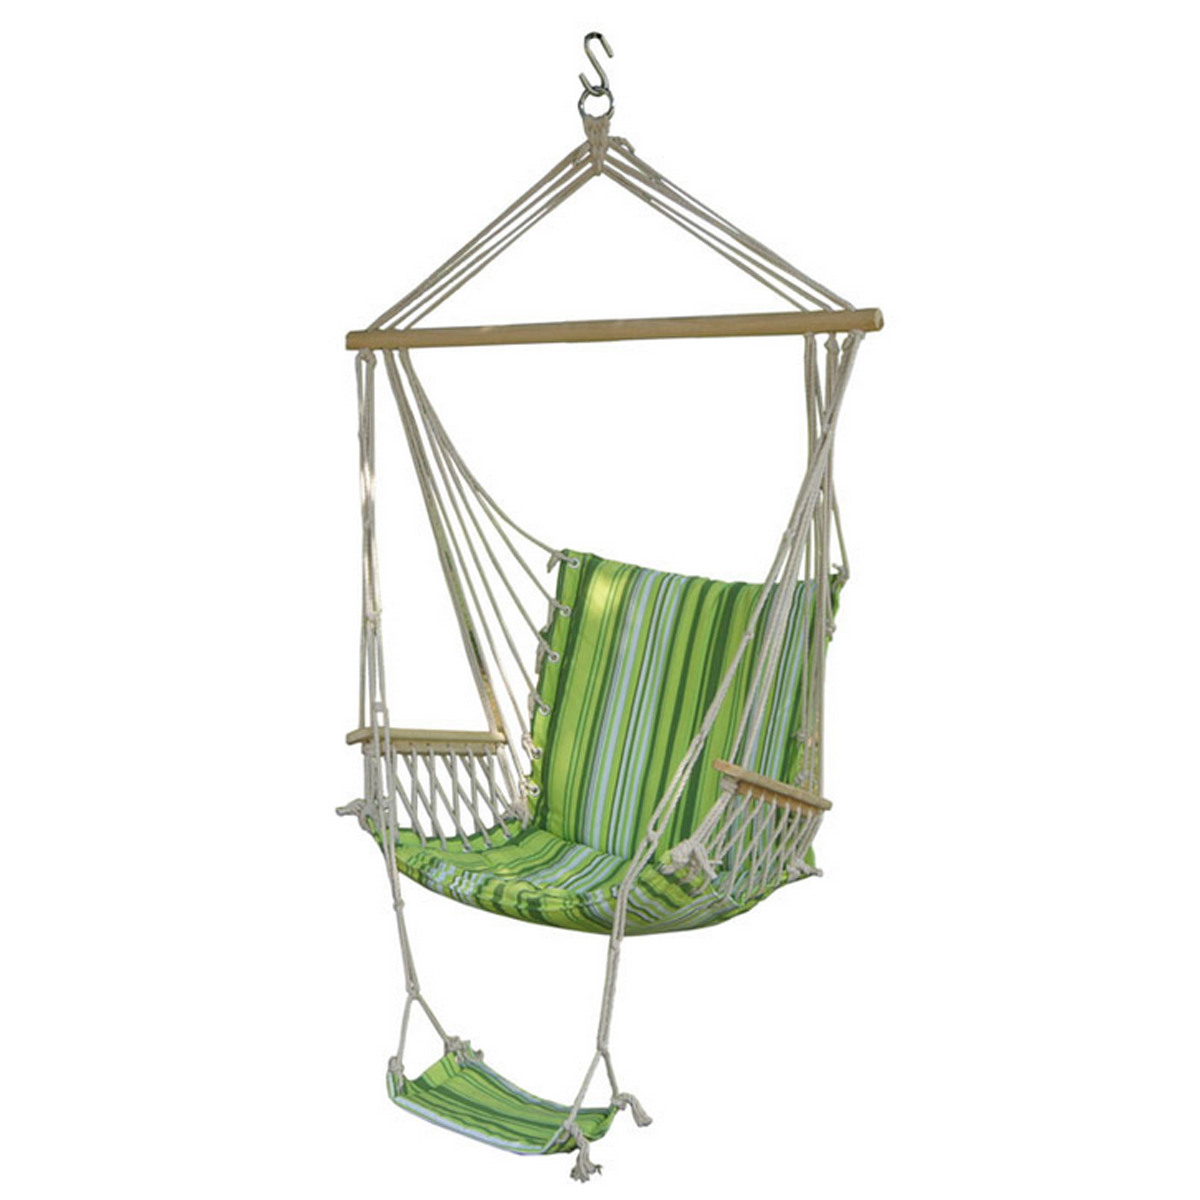 hamac balan oire suspendu chaise ext rieure jardin cour patio 330lbs max achat vente hamac. Black Bedroom Furniture Sets. Home Design Ideas